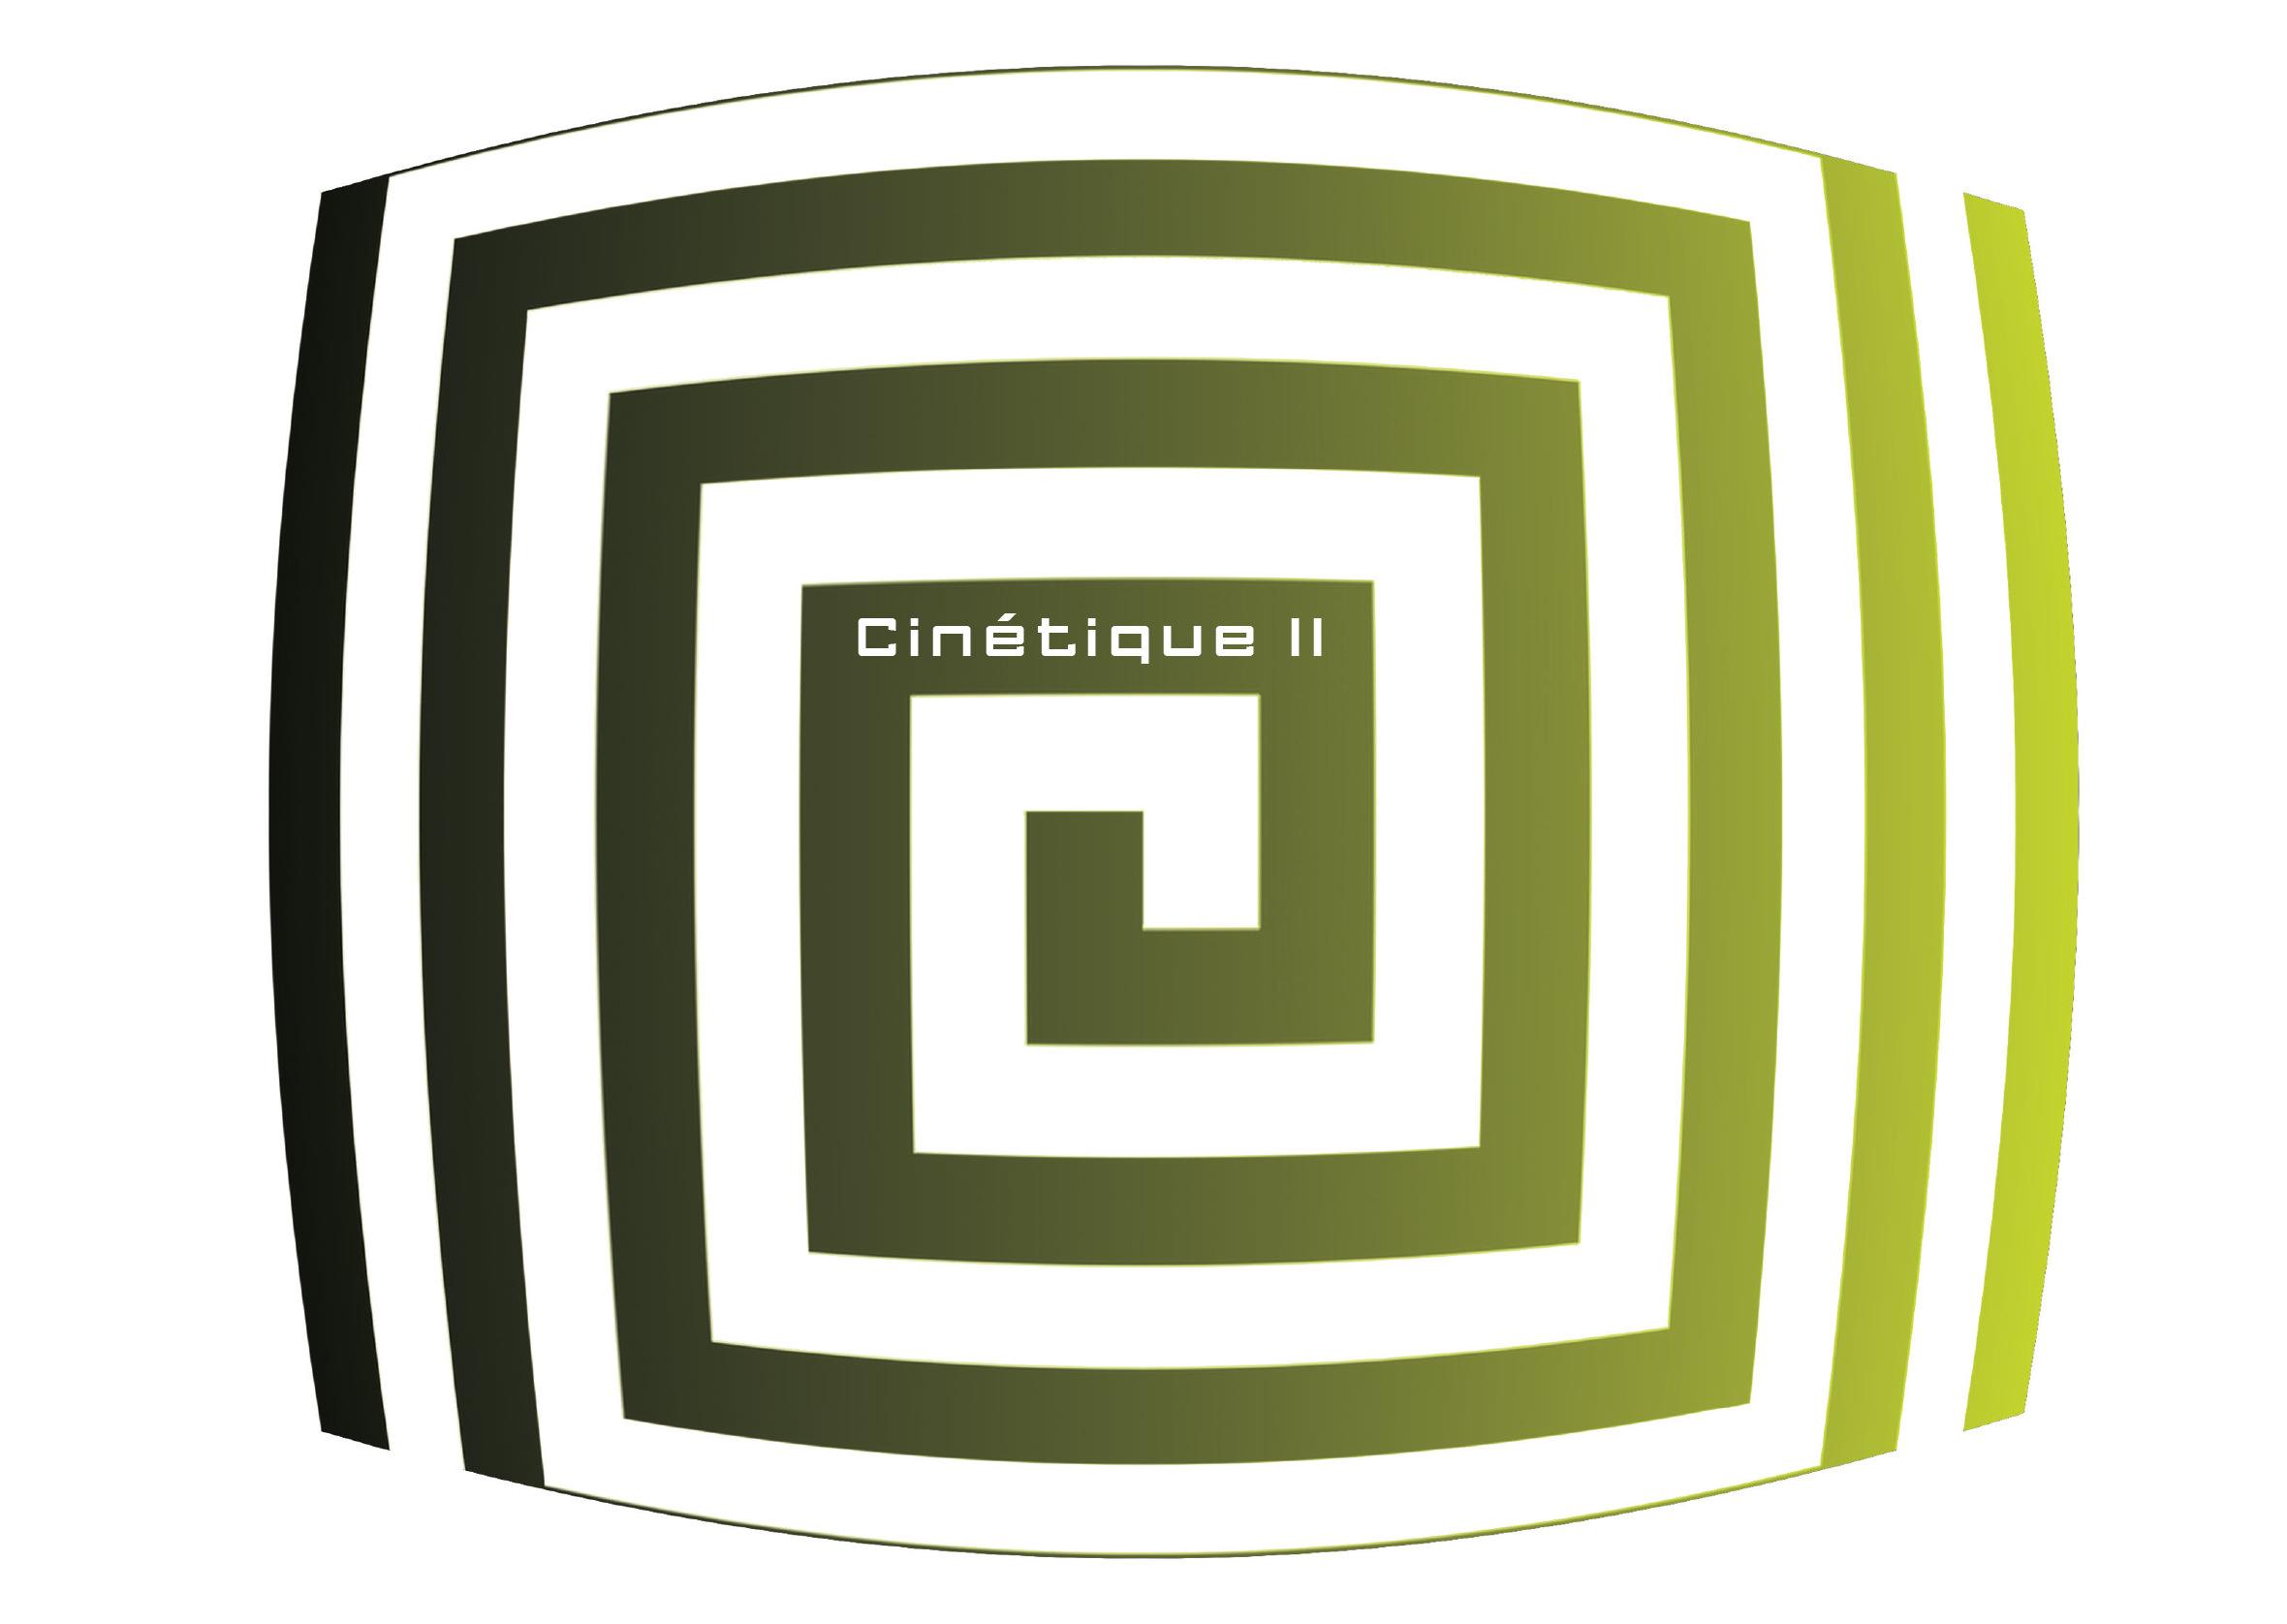 cinetique-2-a.indd